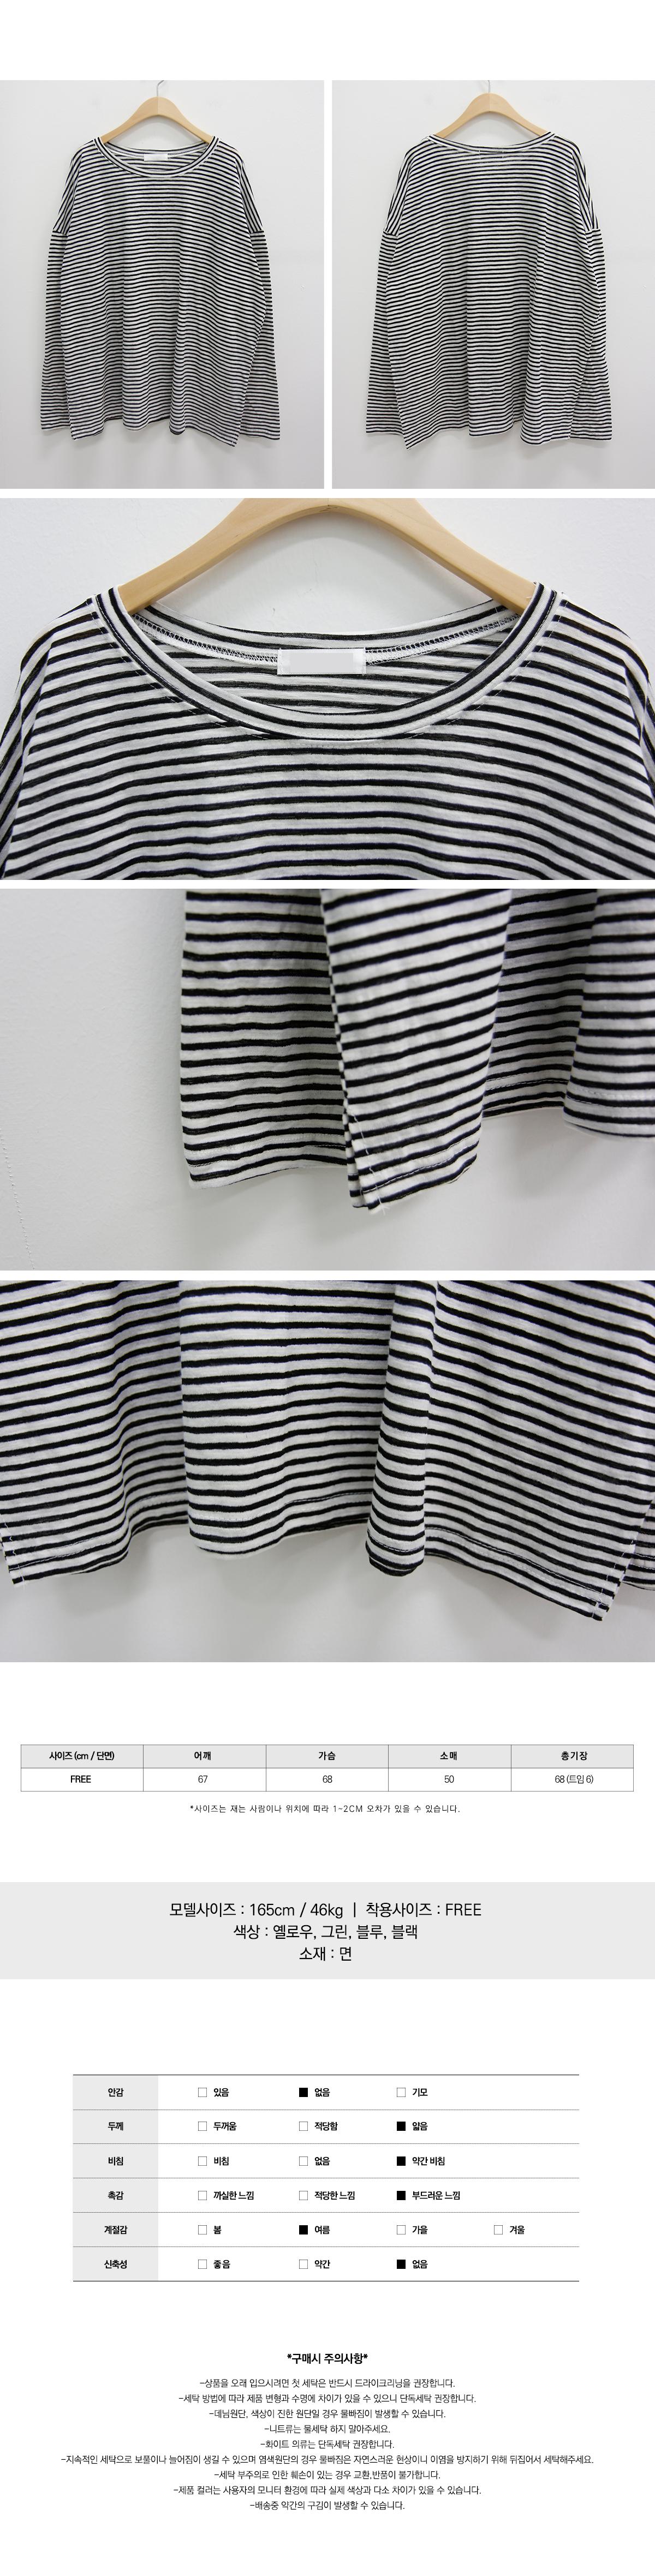 Tok Striped t